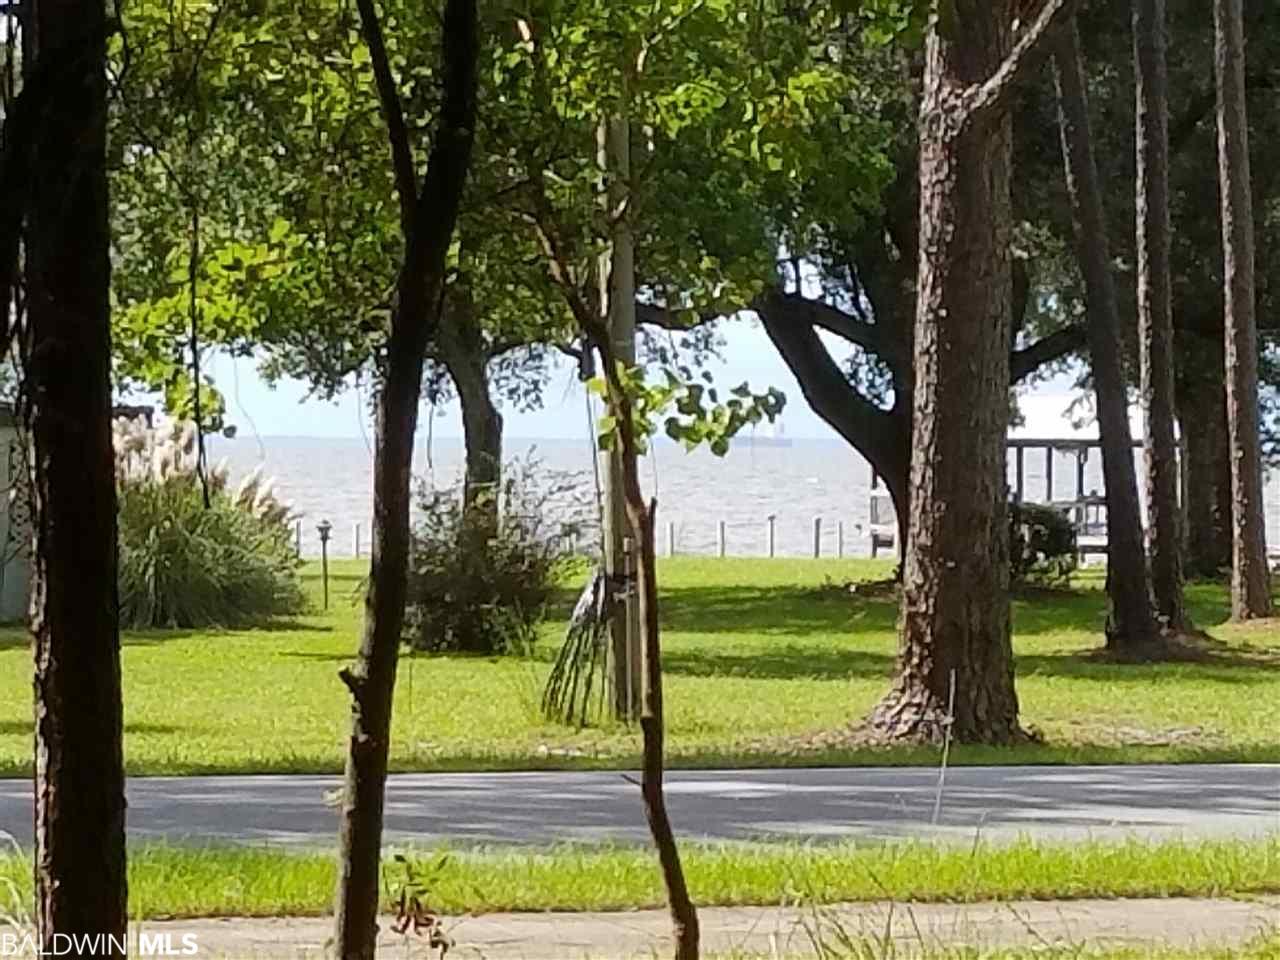 14000 Scenic Highway 98, Fairhope, AL 36532